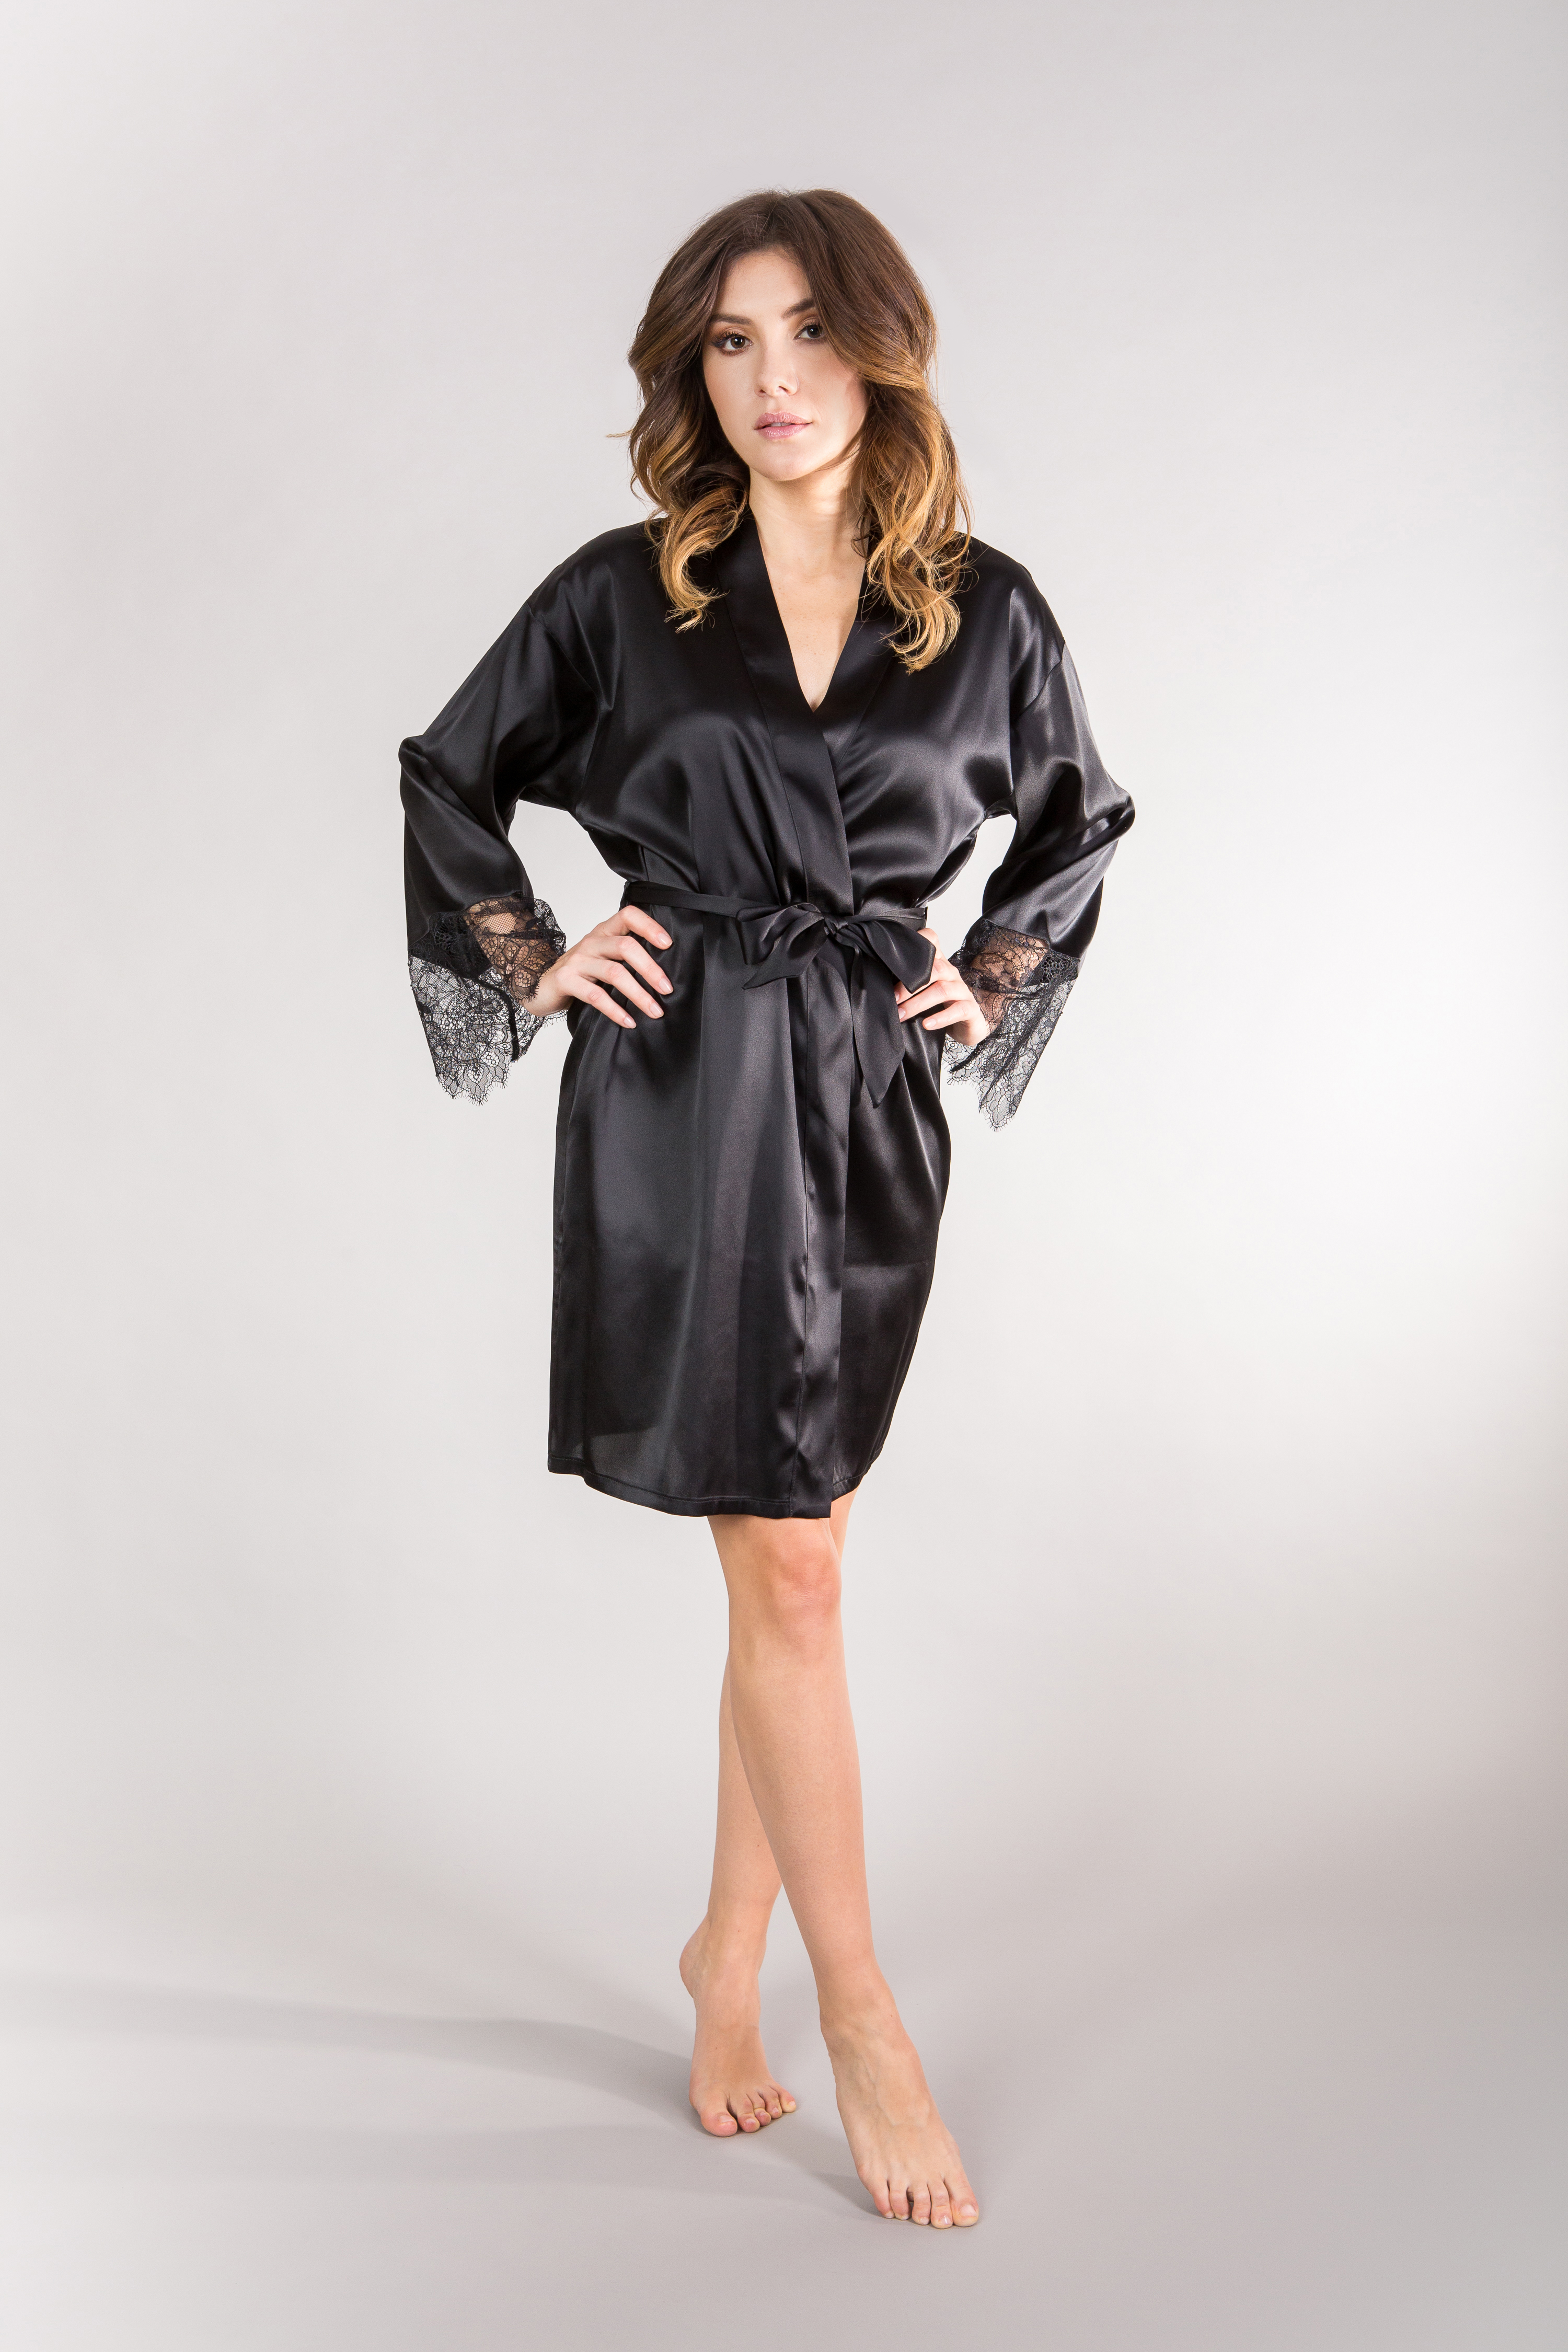 c87f4e8ddd33 Jedwabny szlafrok czarny - All Black Silk Robe - Le Brate